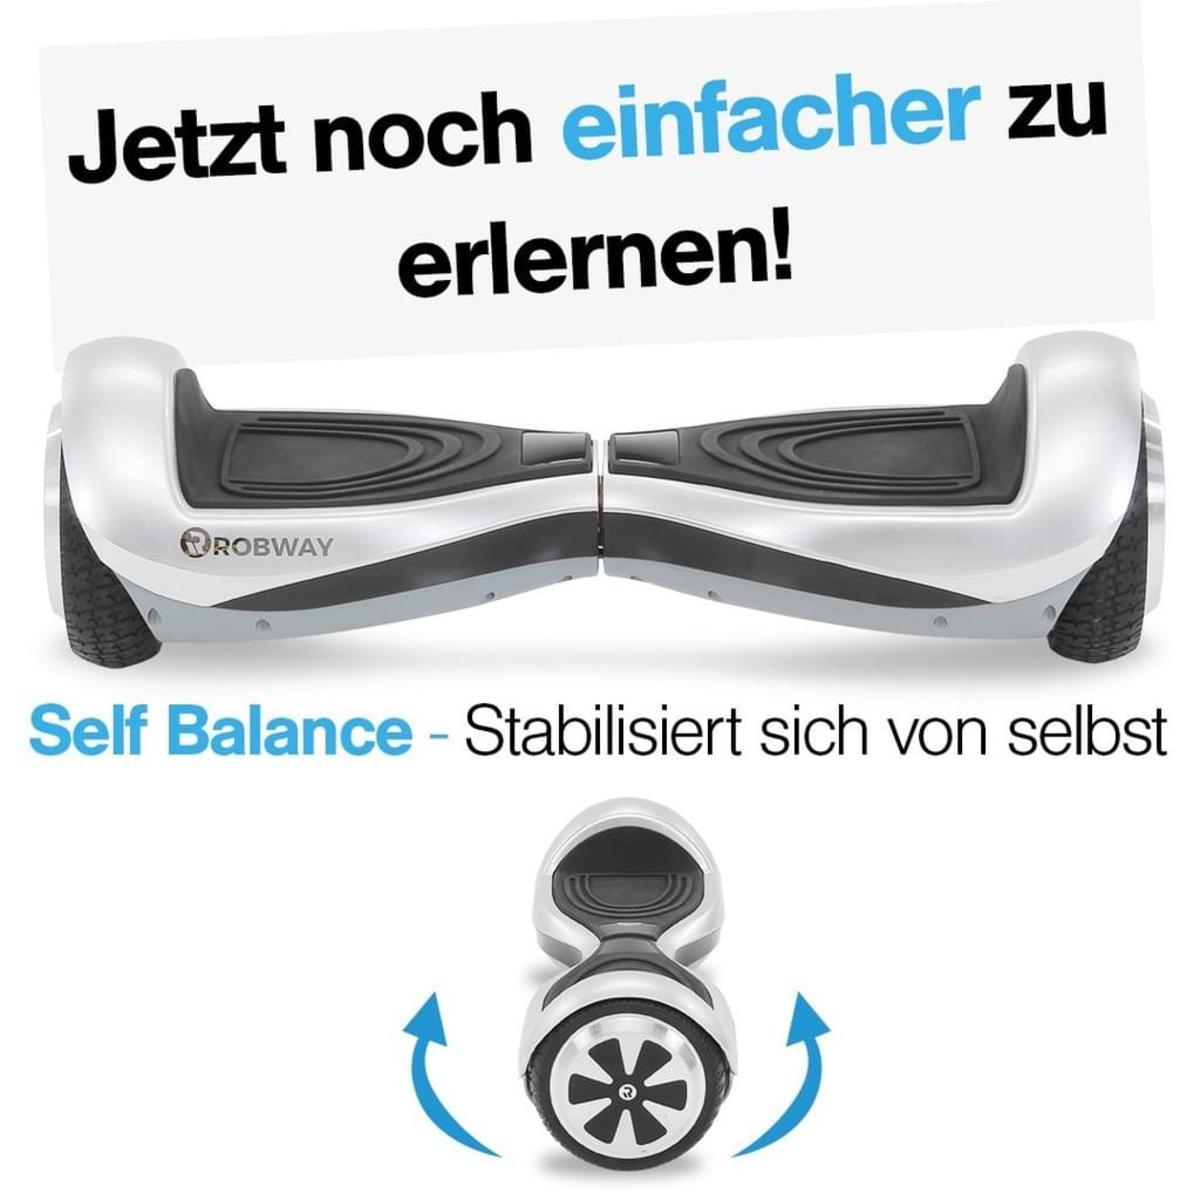 Bild 2 von Hoverboard ROBWAY Q1 E-Balance Board Scooter Elektro Roller Smart Self Balance (Light Silver)